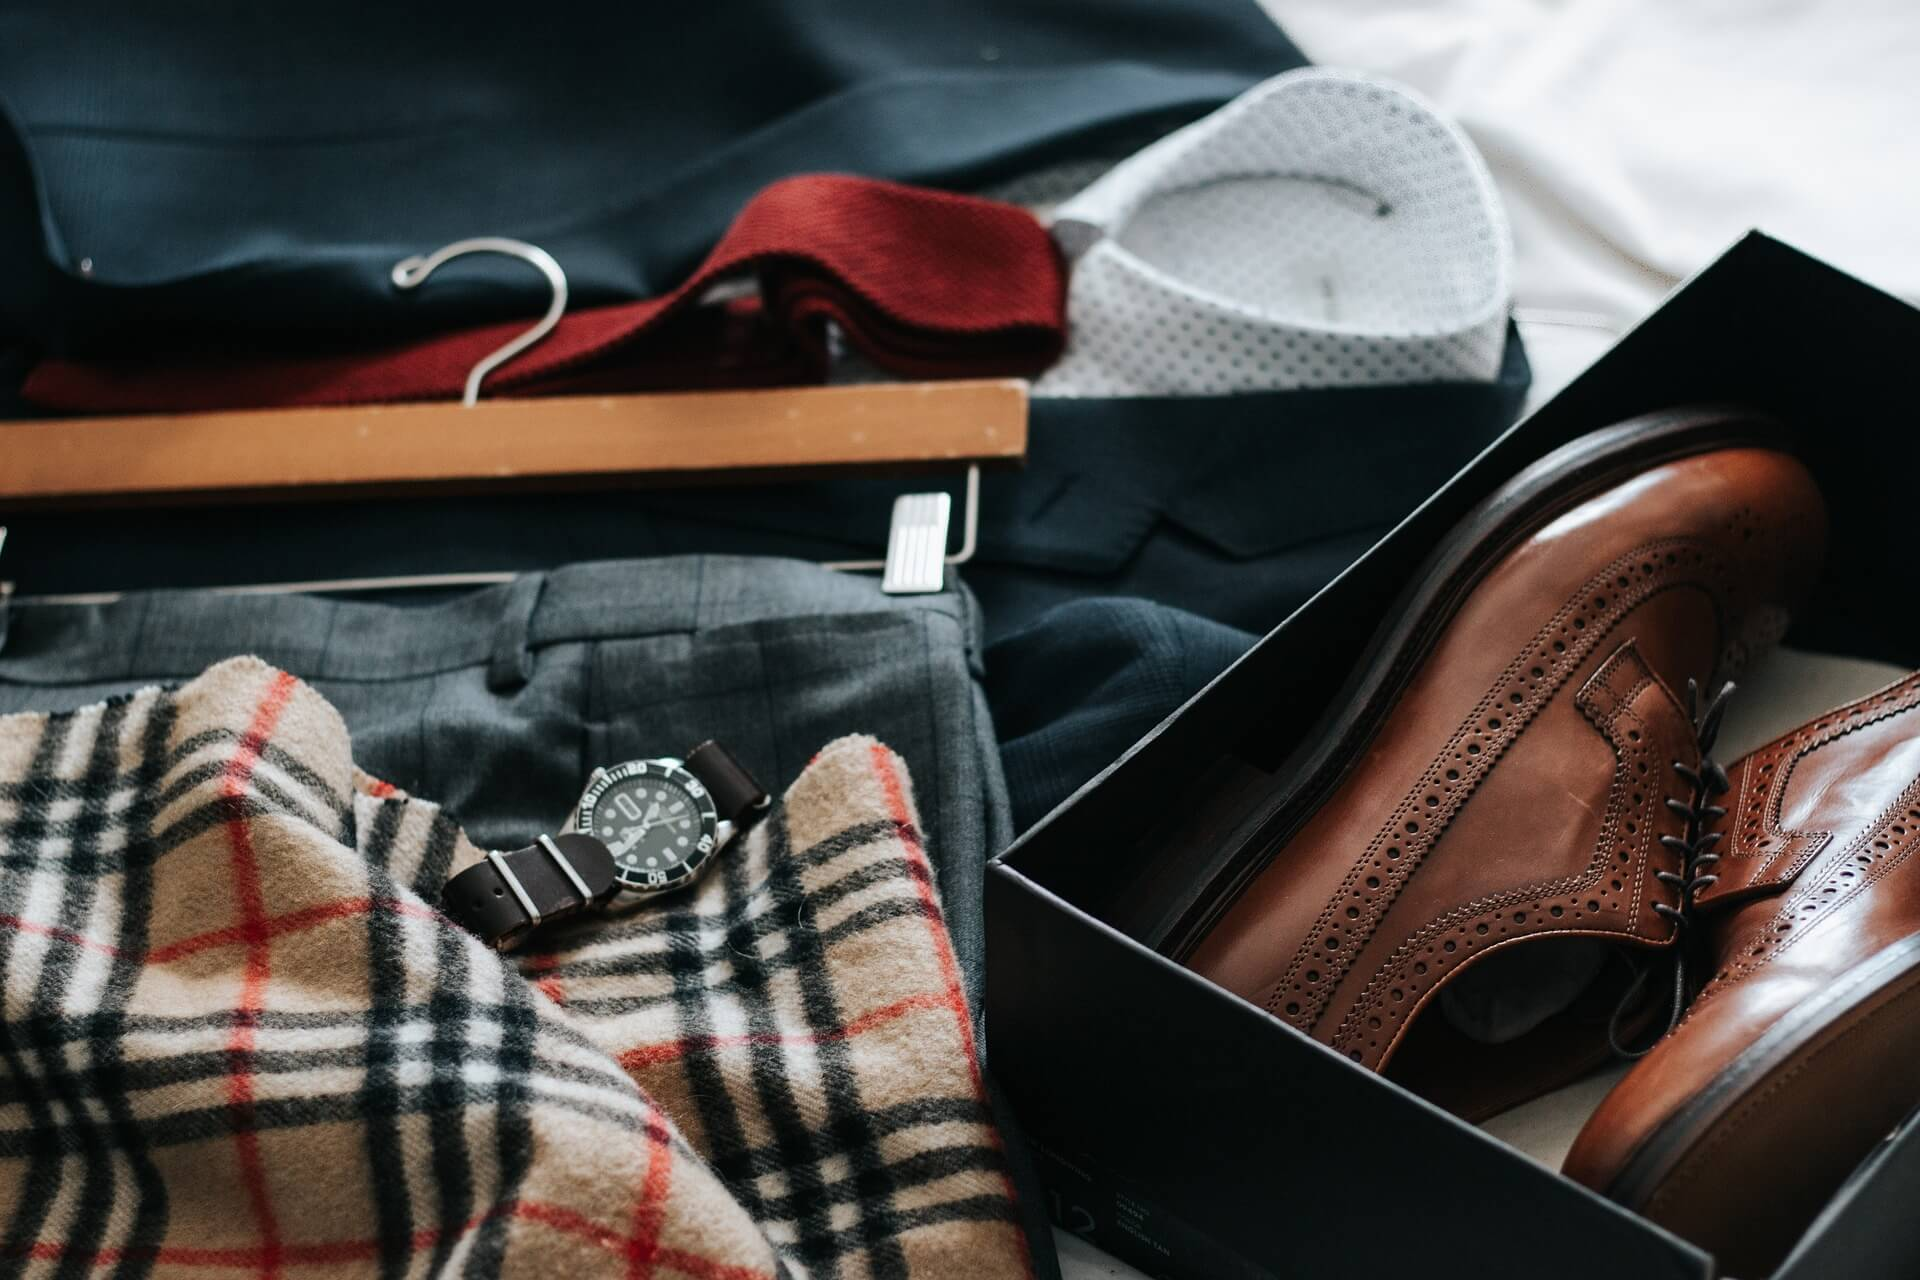 Männerbekleidung samt Zubehör